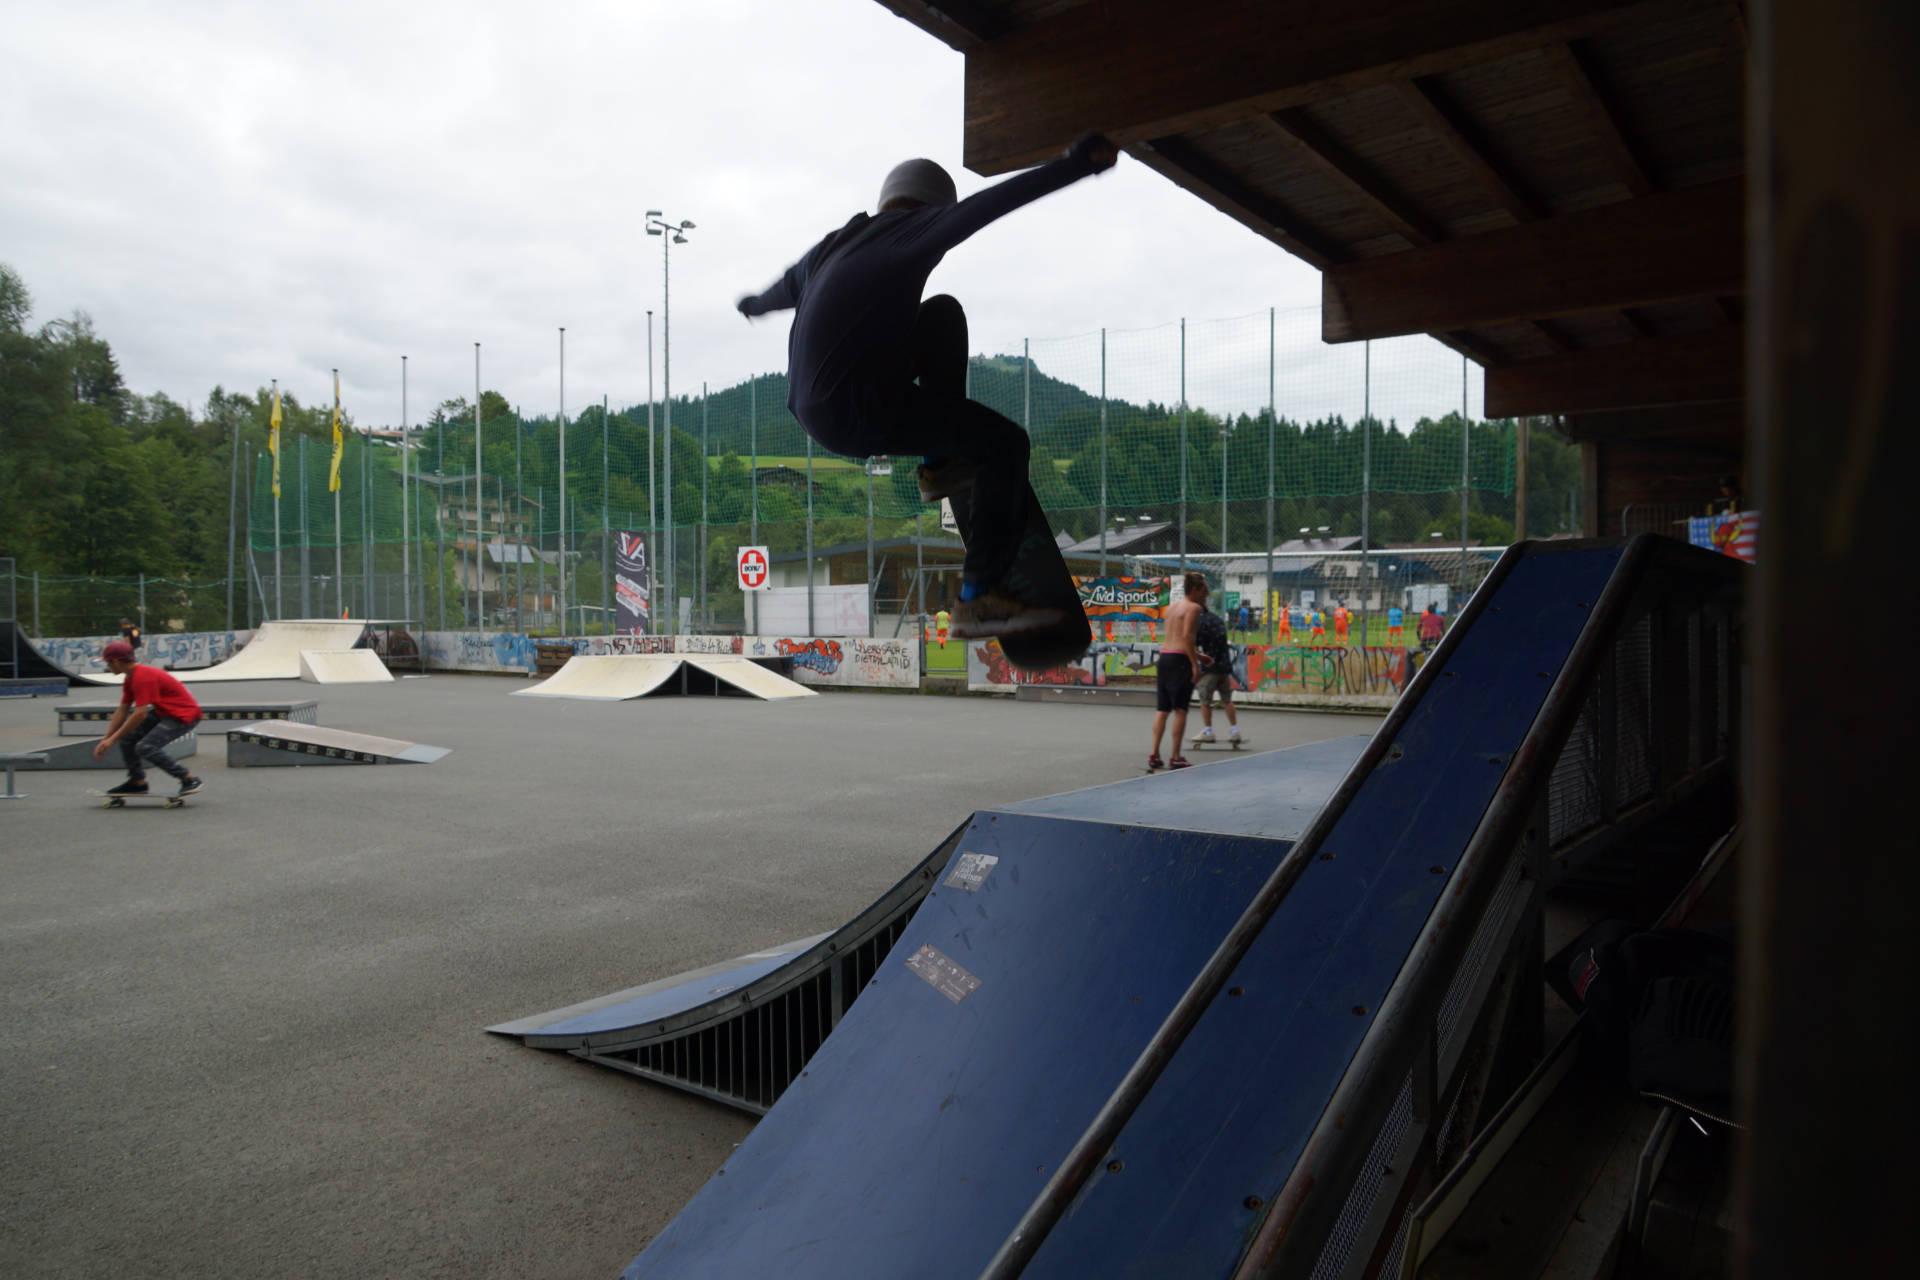 skateboardheadz fieberbrunn kgt 2019 finale 00026